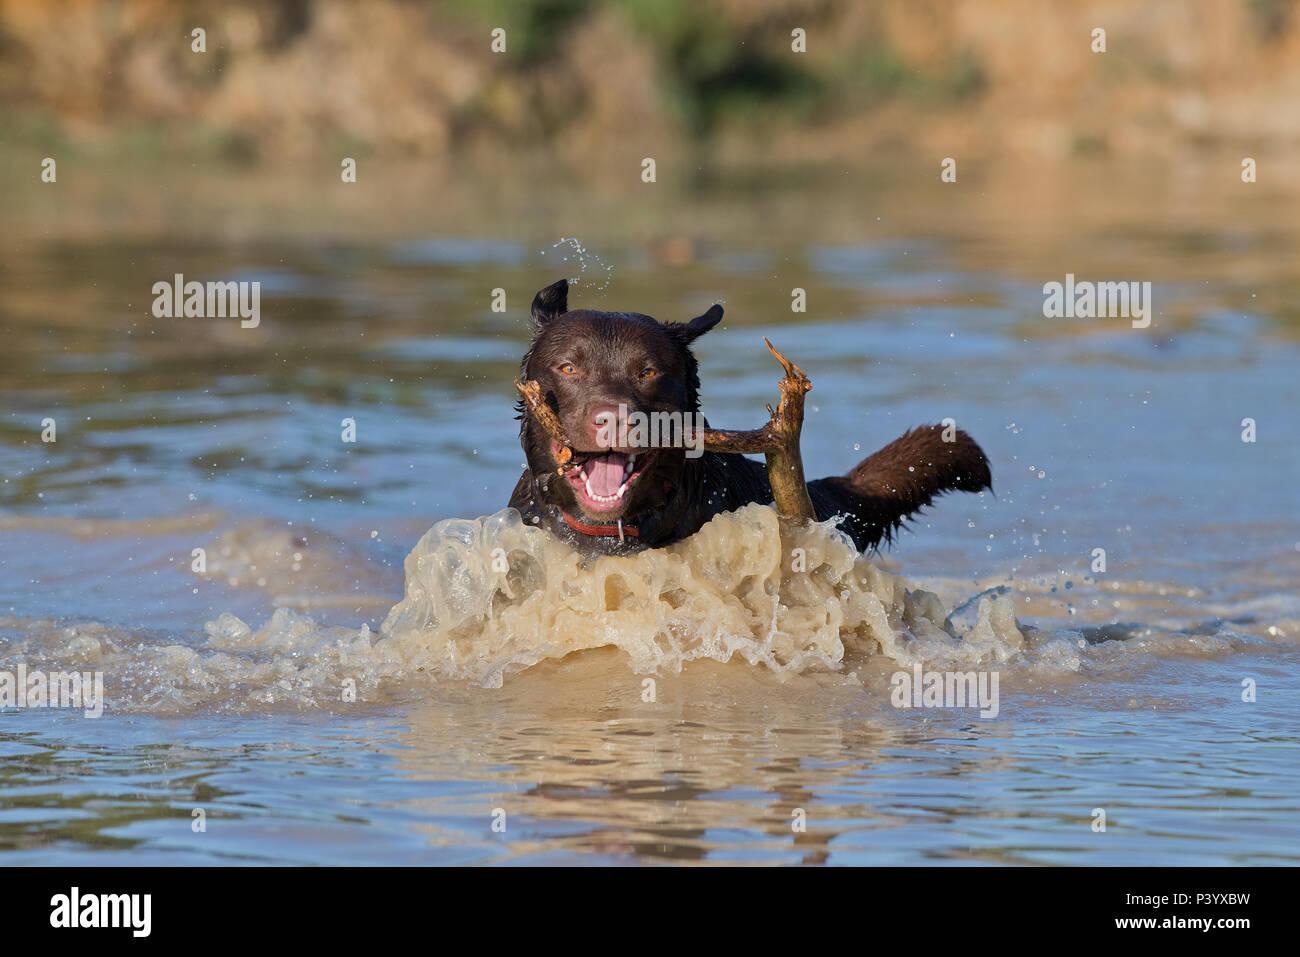 Labrador Retriever dog-Canis lupus familiaris. - Stock Image